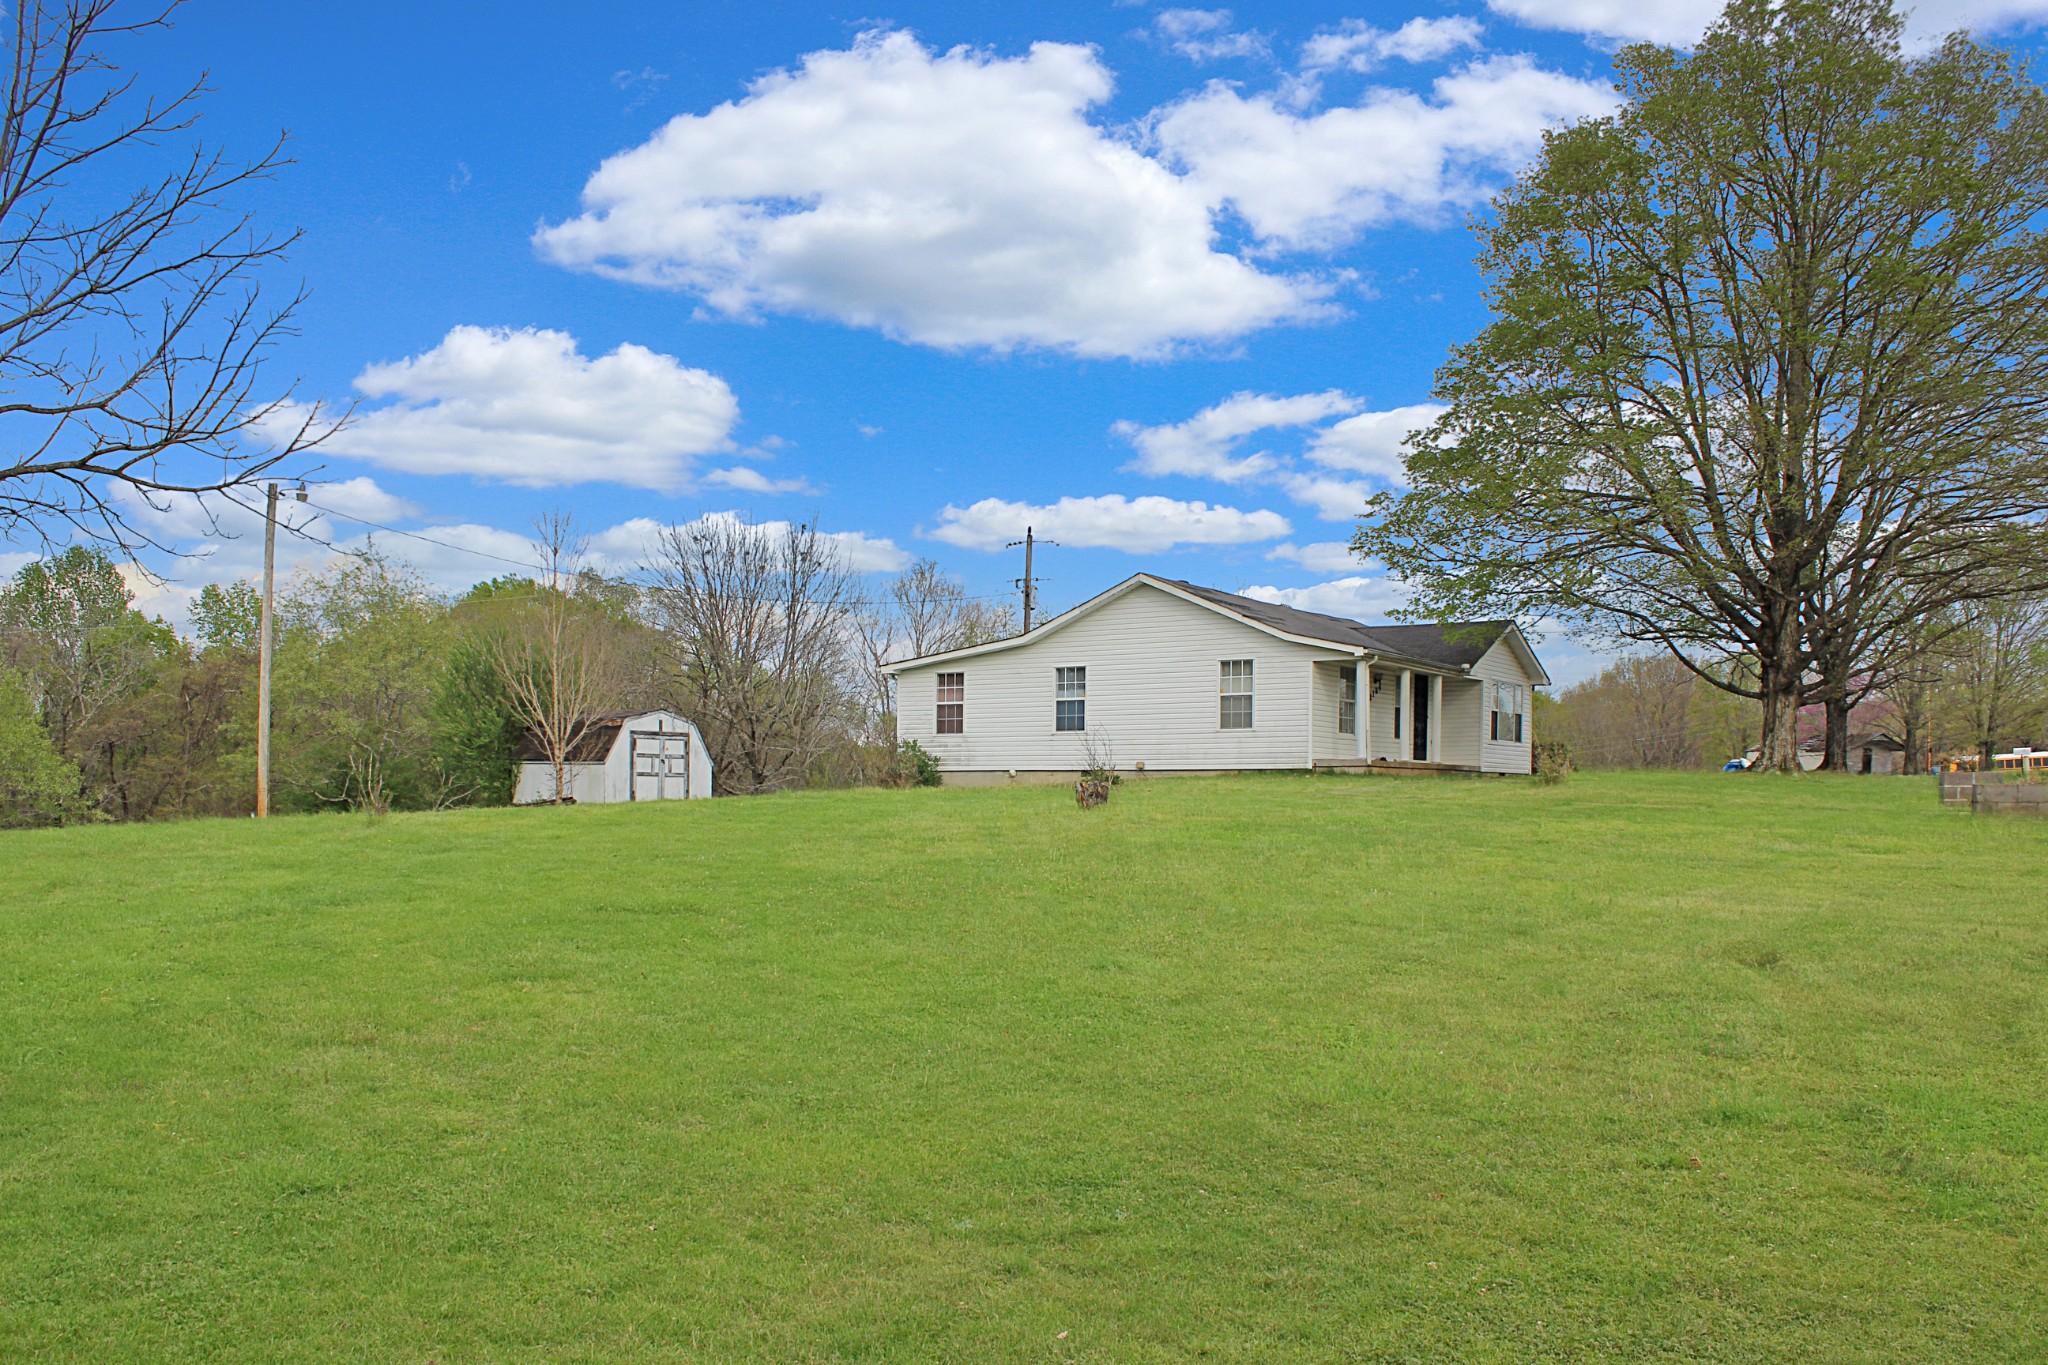 2180 Highway 120 Property Photo - Big Rock, TN real estate listing